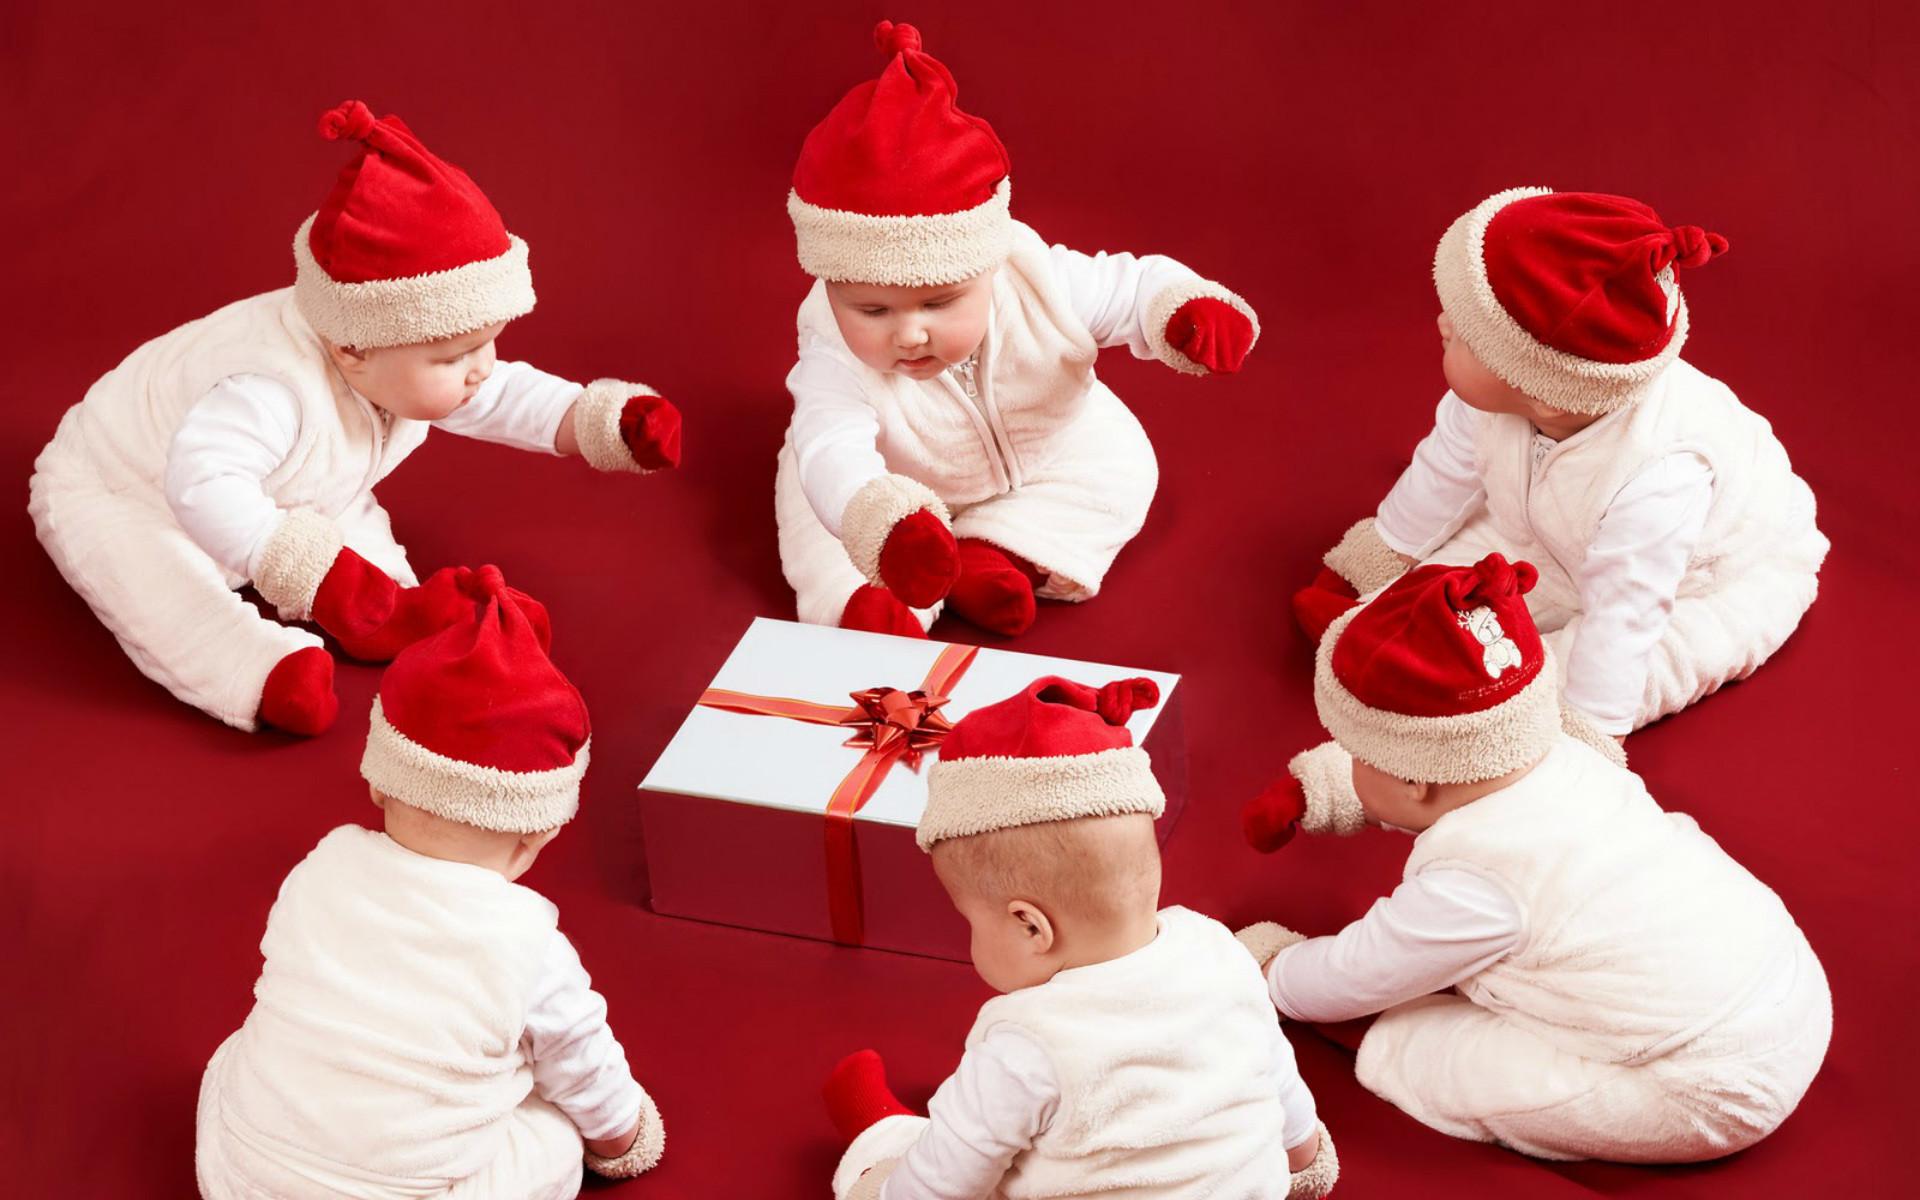 15 Beautiful Merry Christmas Santa Claus Hd Wallpapers